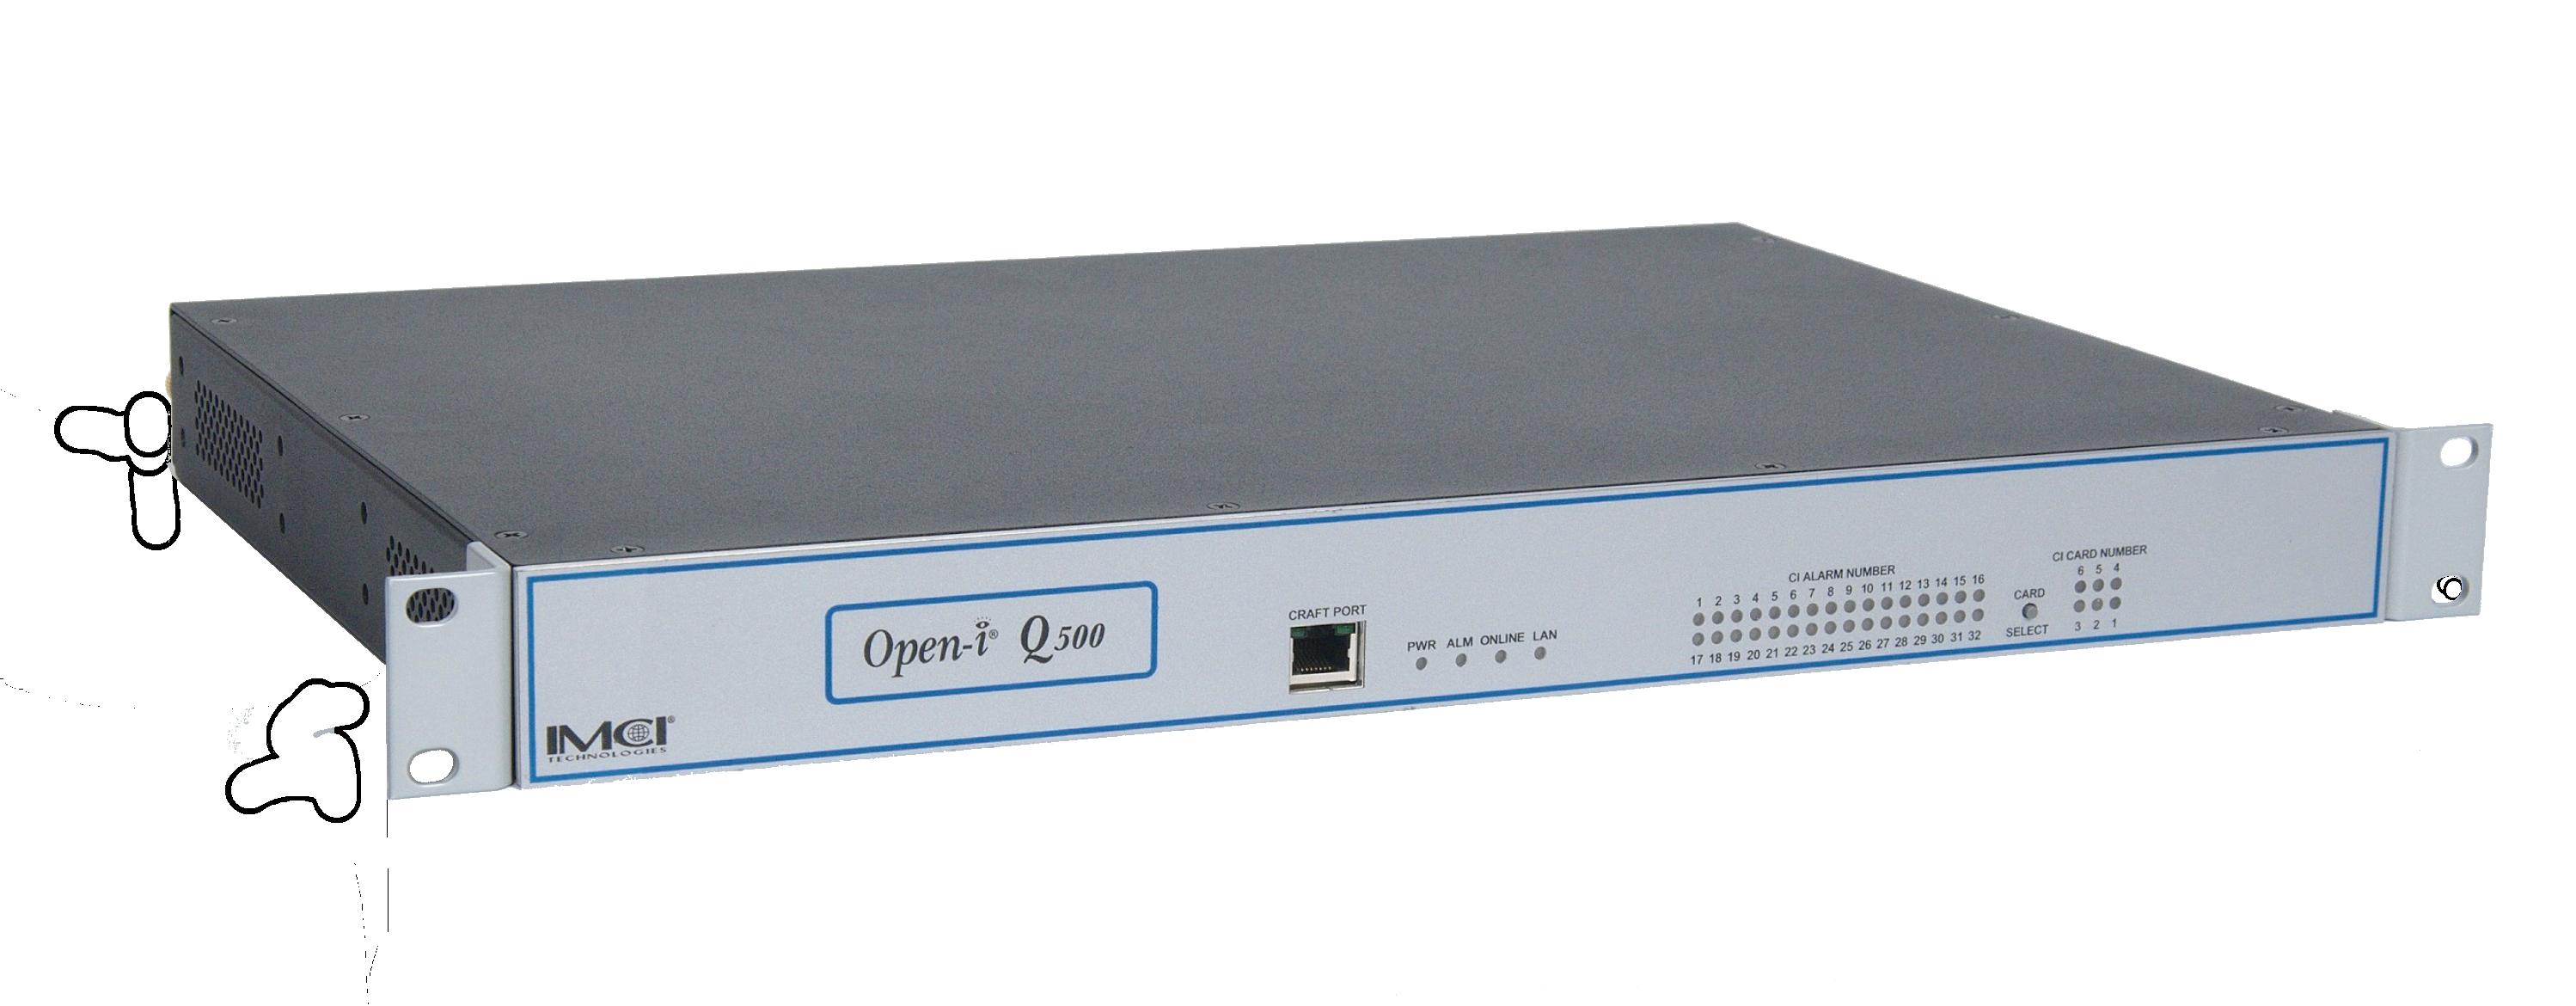 Open-i Q500